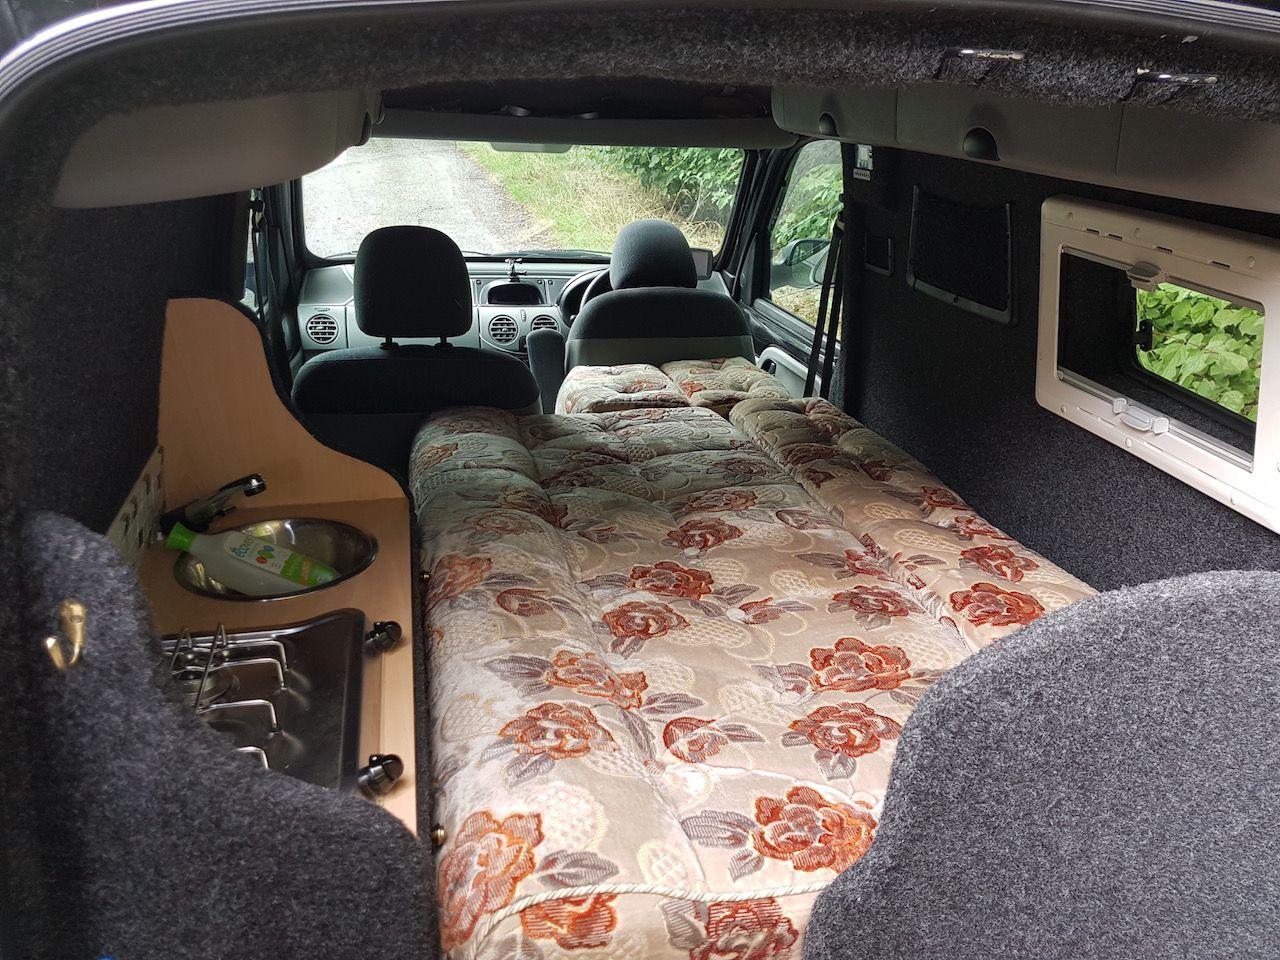 Renault Kangoo Micro Camper Travel Van Self Converted As An Economical And Practical Camper For Travel Micro Camper Ford Transit Connect Camper Renault Kangoo